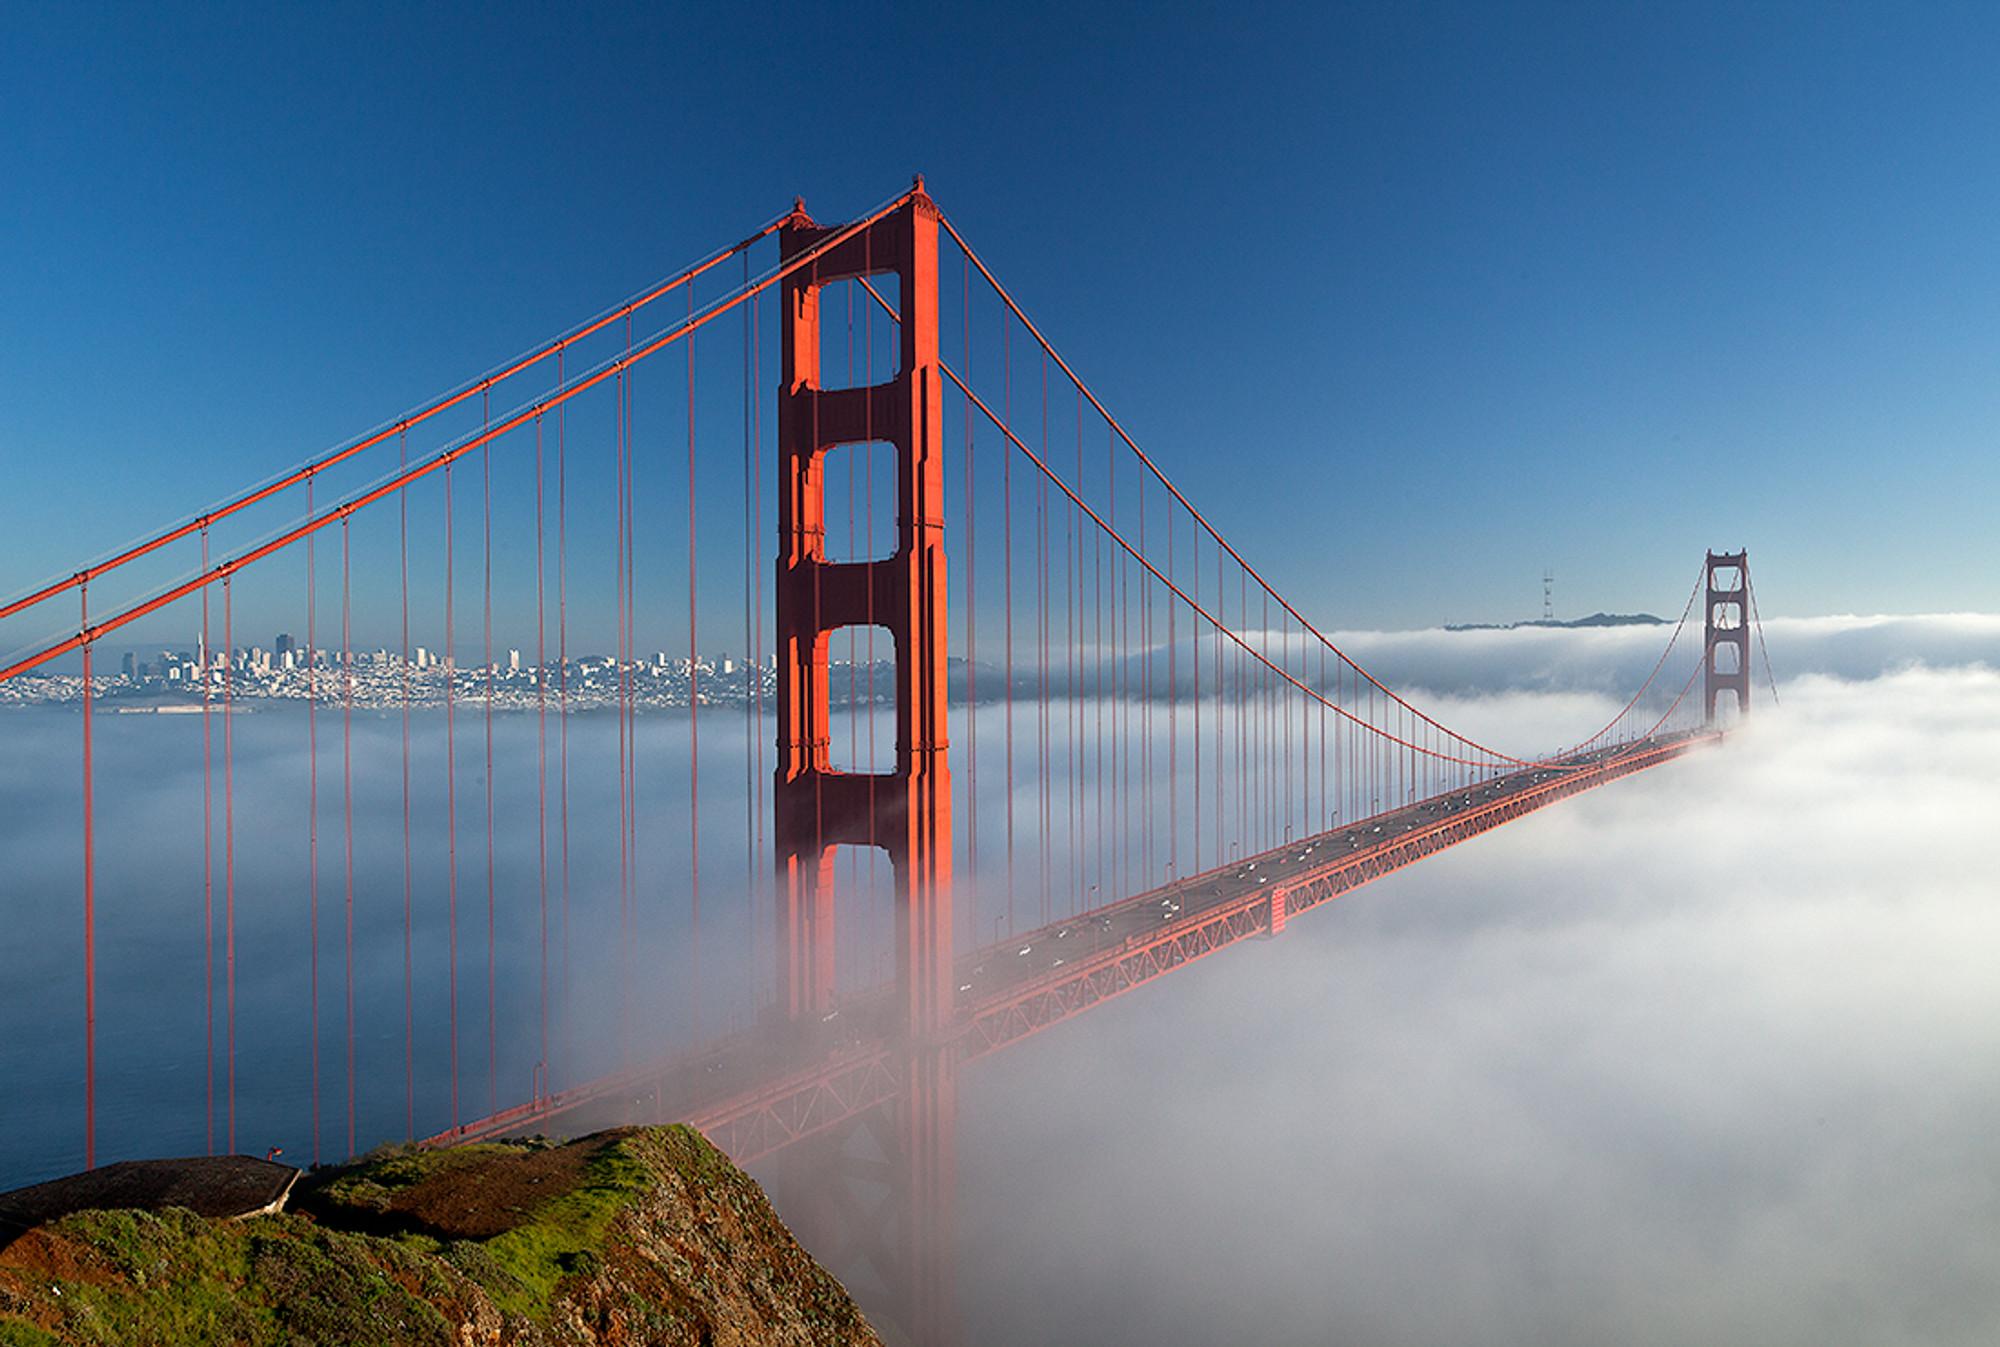 Panoramic Wallpaper Fall Golden Gate Bridge And Winter Fog Vern Clevenger Photography